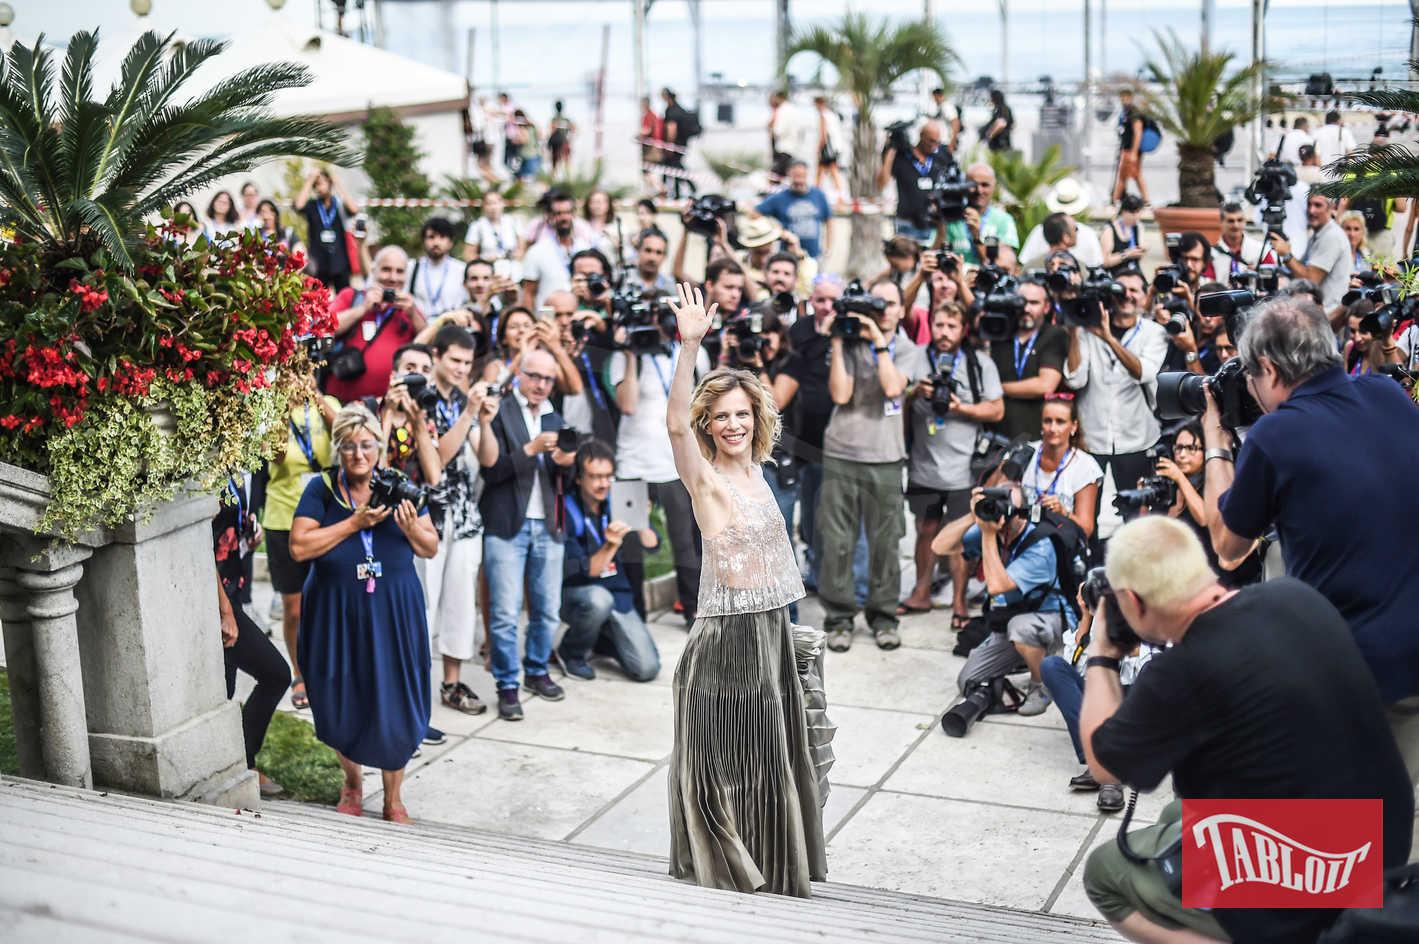 Sonia Bergamasco festival cinema venezia